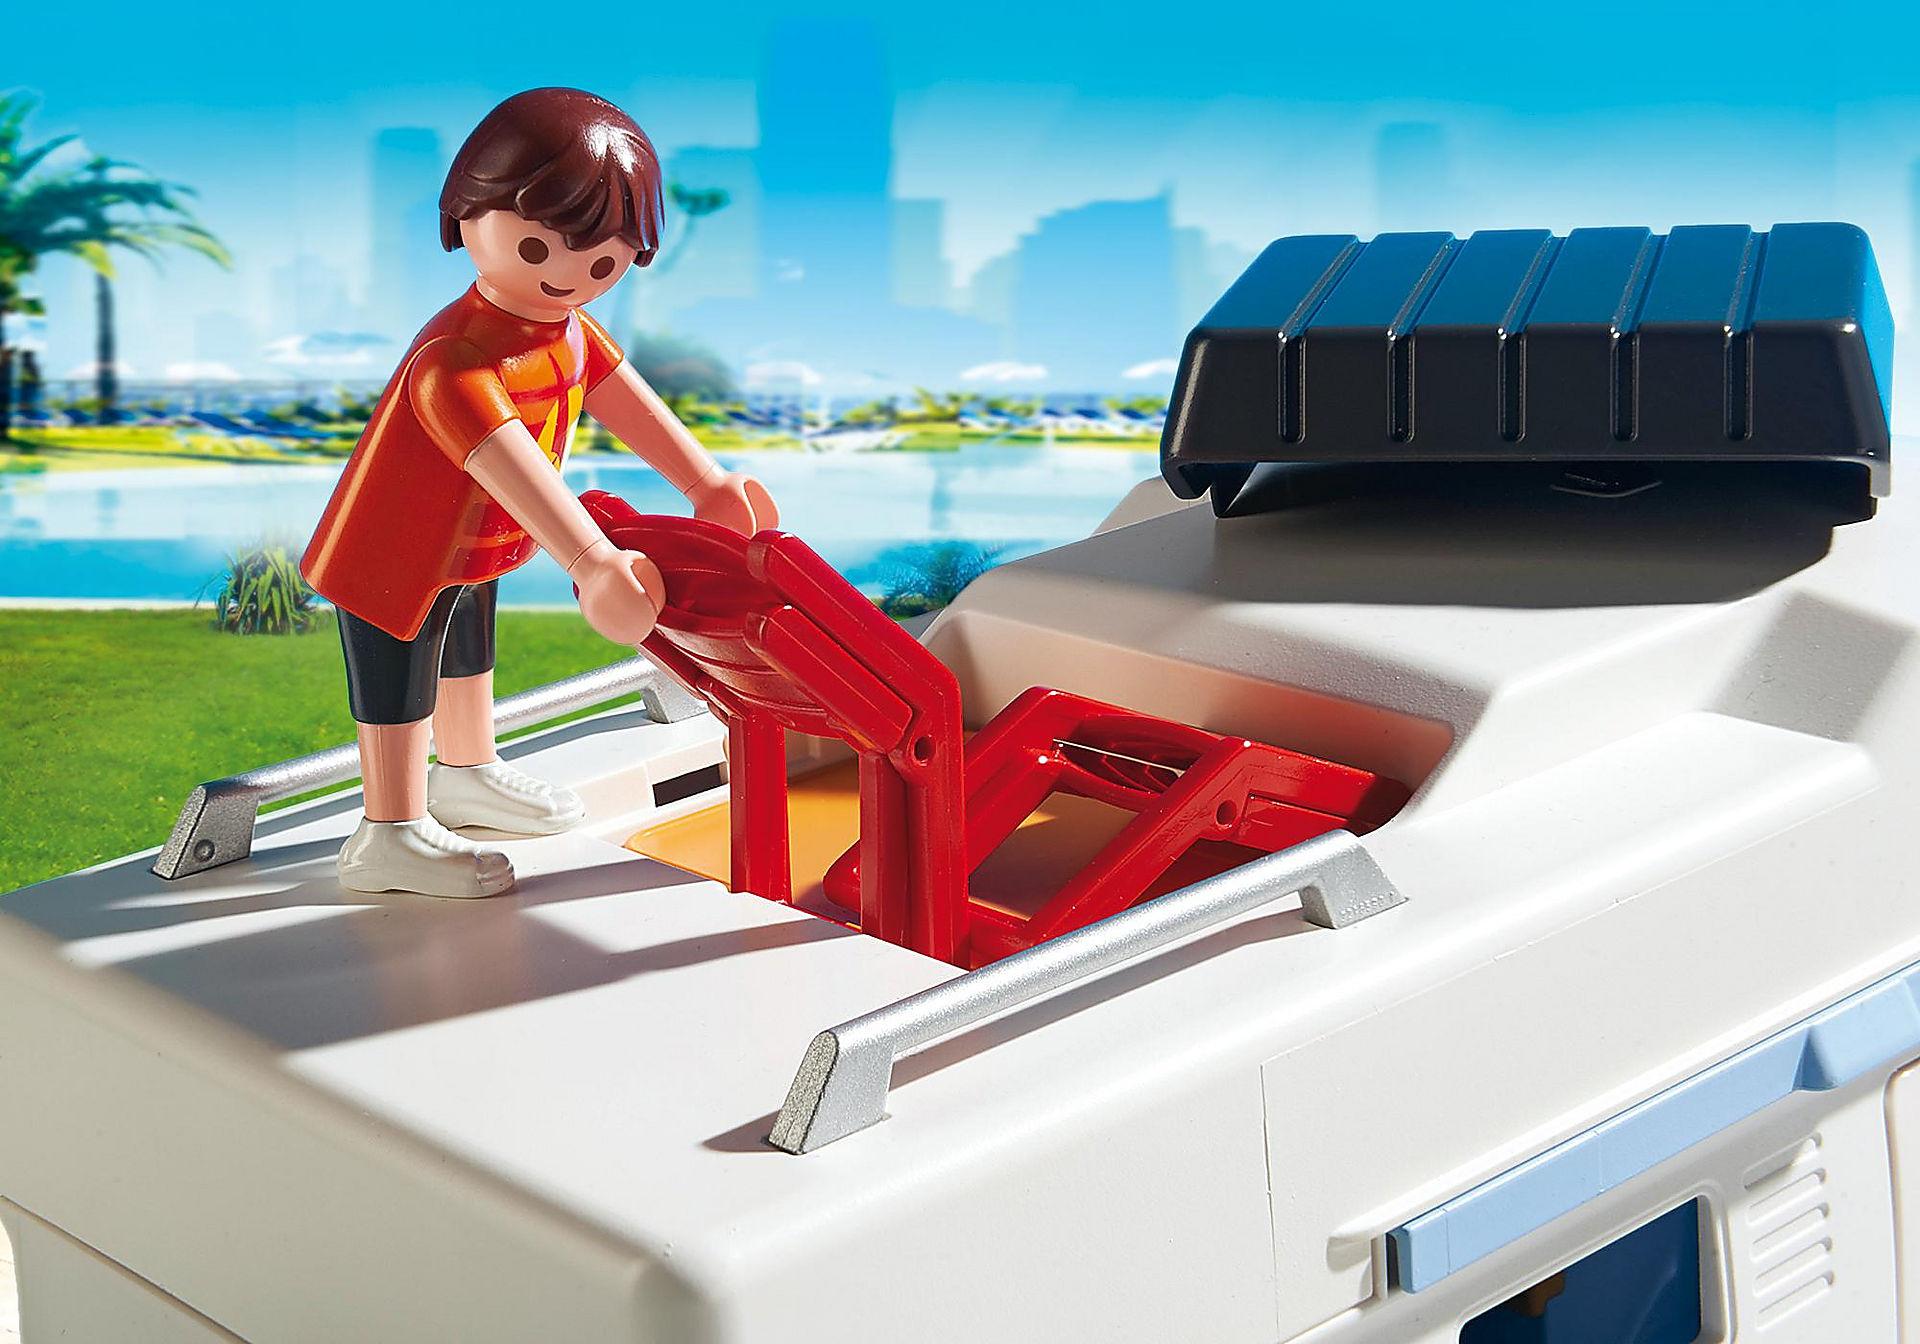 http://media.playmobil.com/i/playmobil/6671_product_extra2/Famille avec camping-car